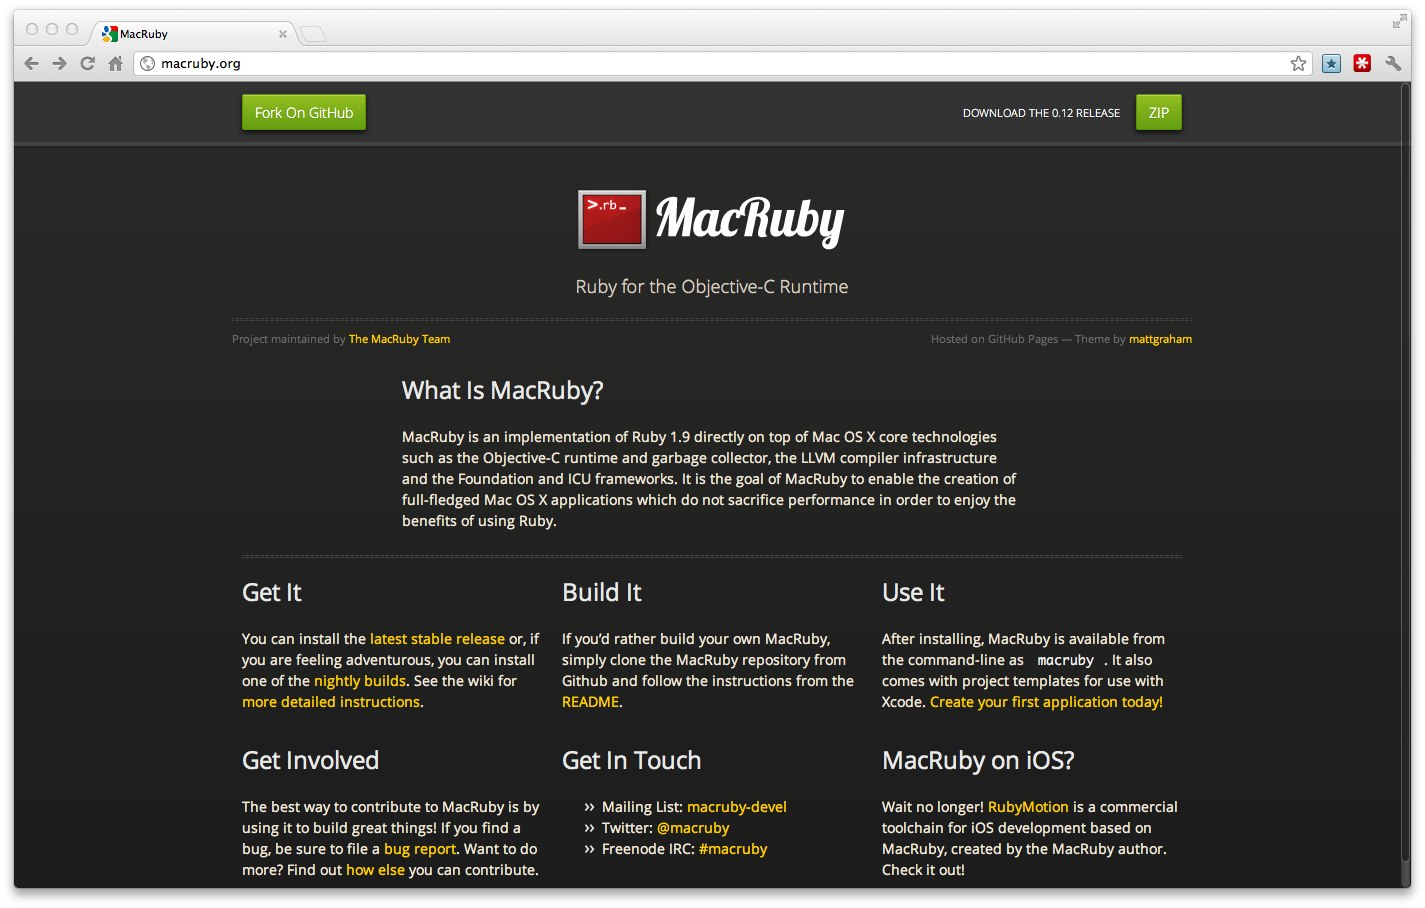 MacRubyのウェブサイトがリニューアルしました